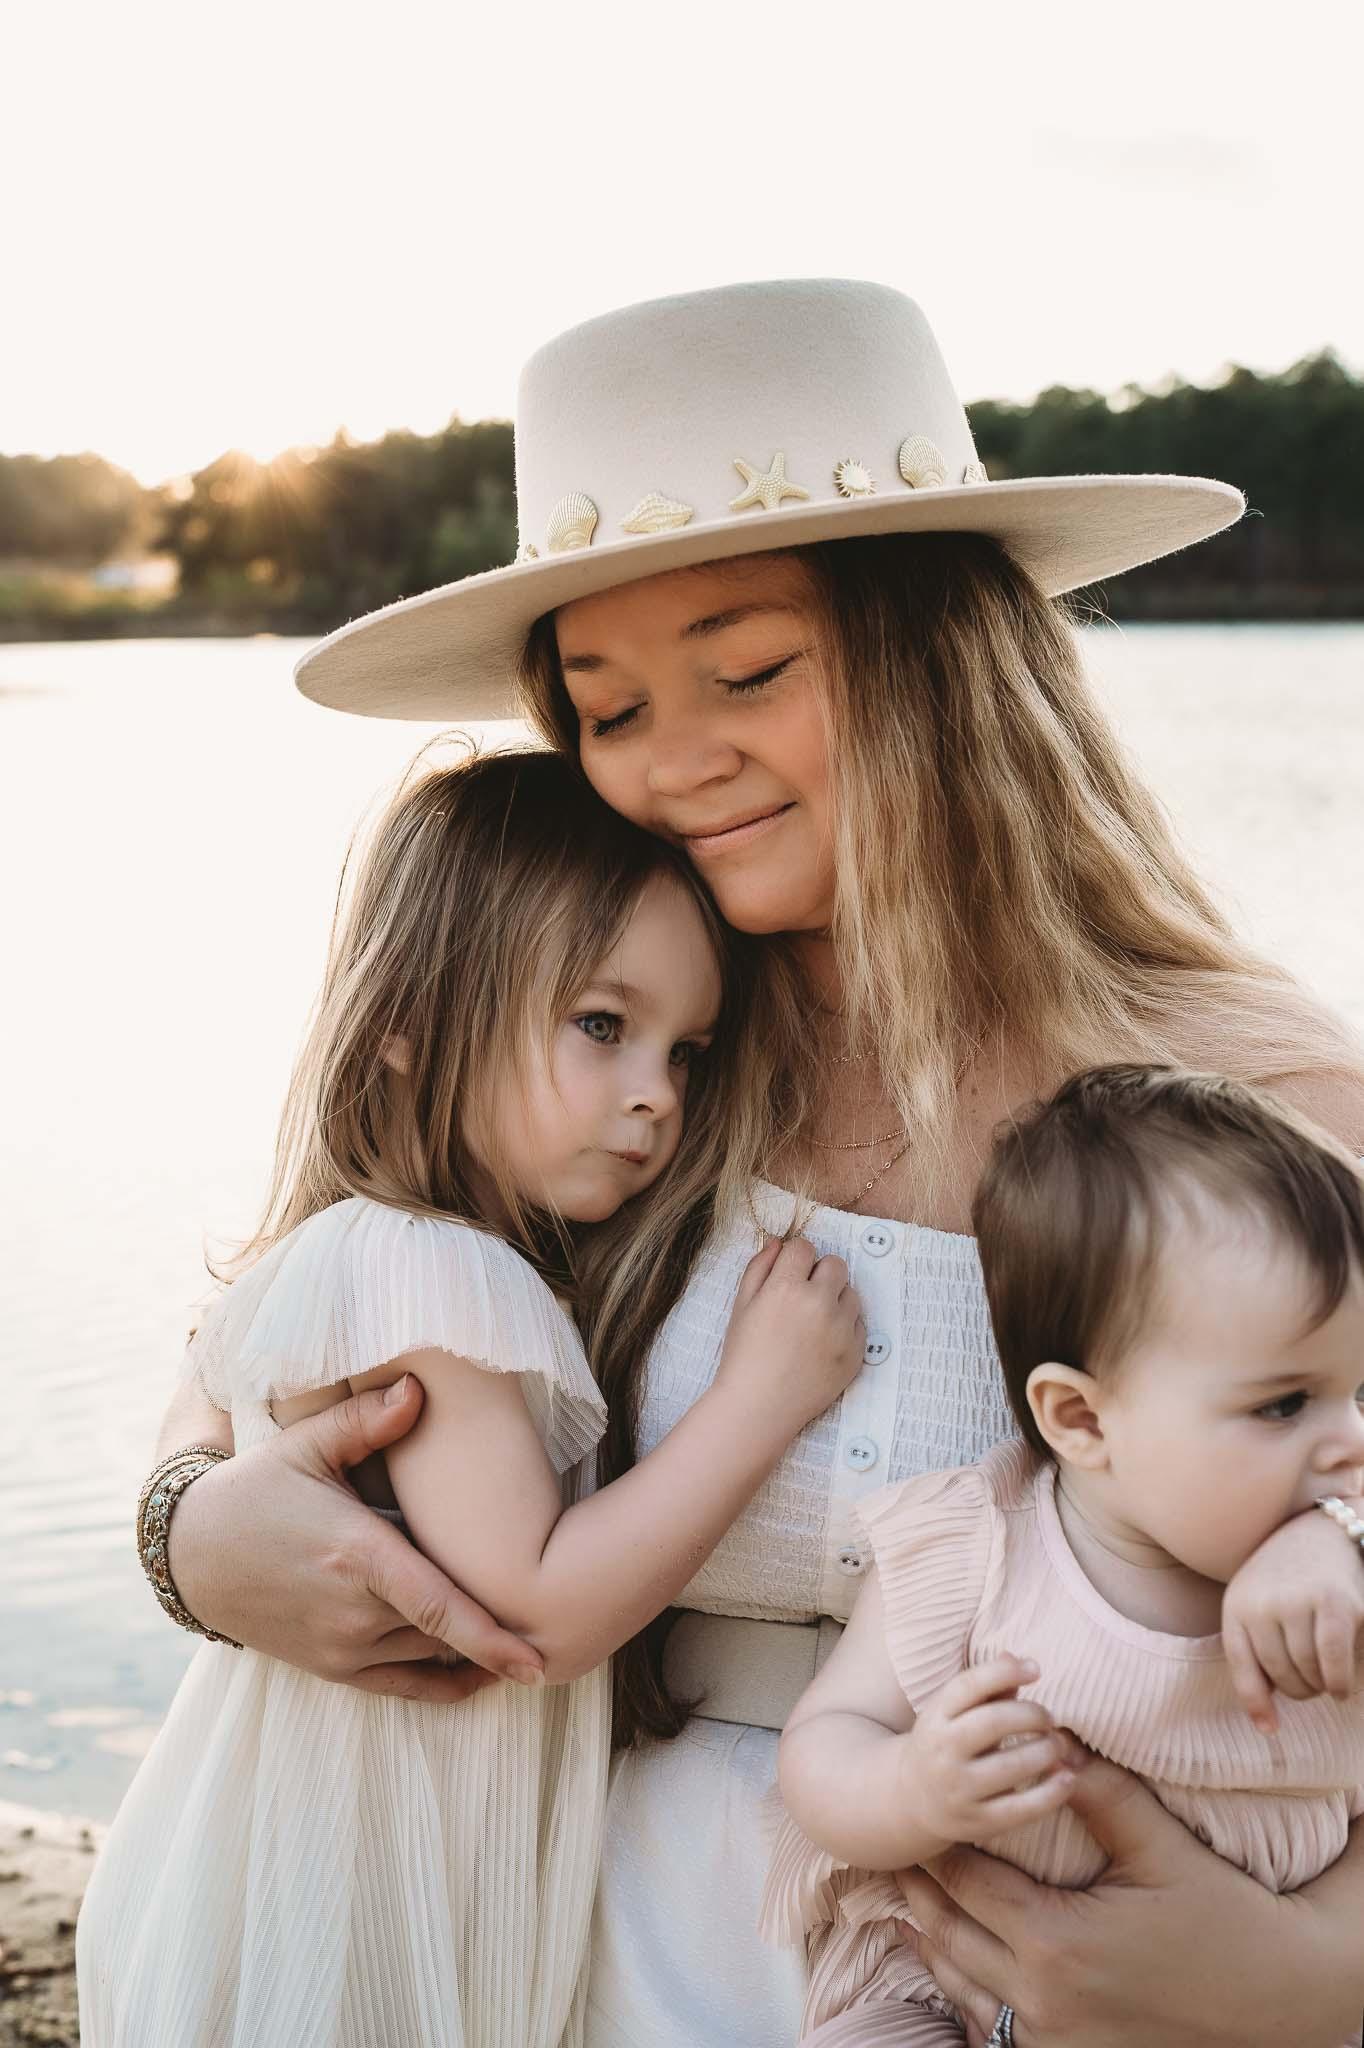 Nicki Odom Mother's Day Gift Ideas